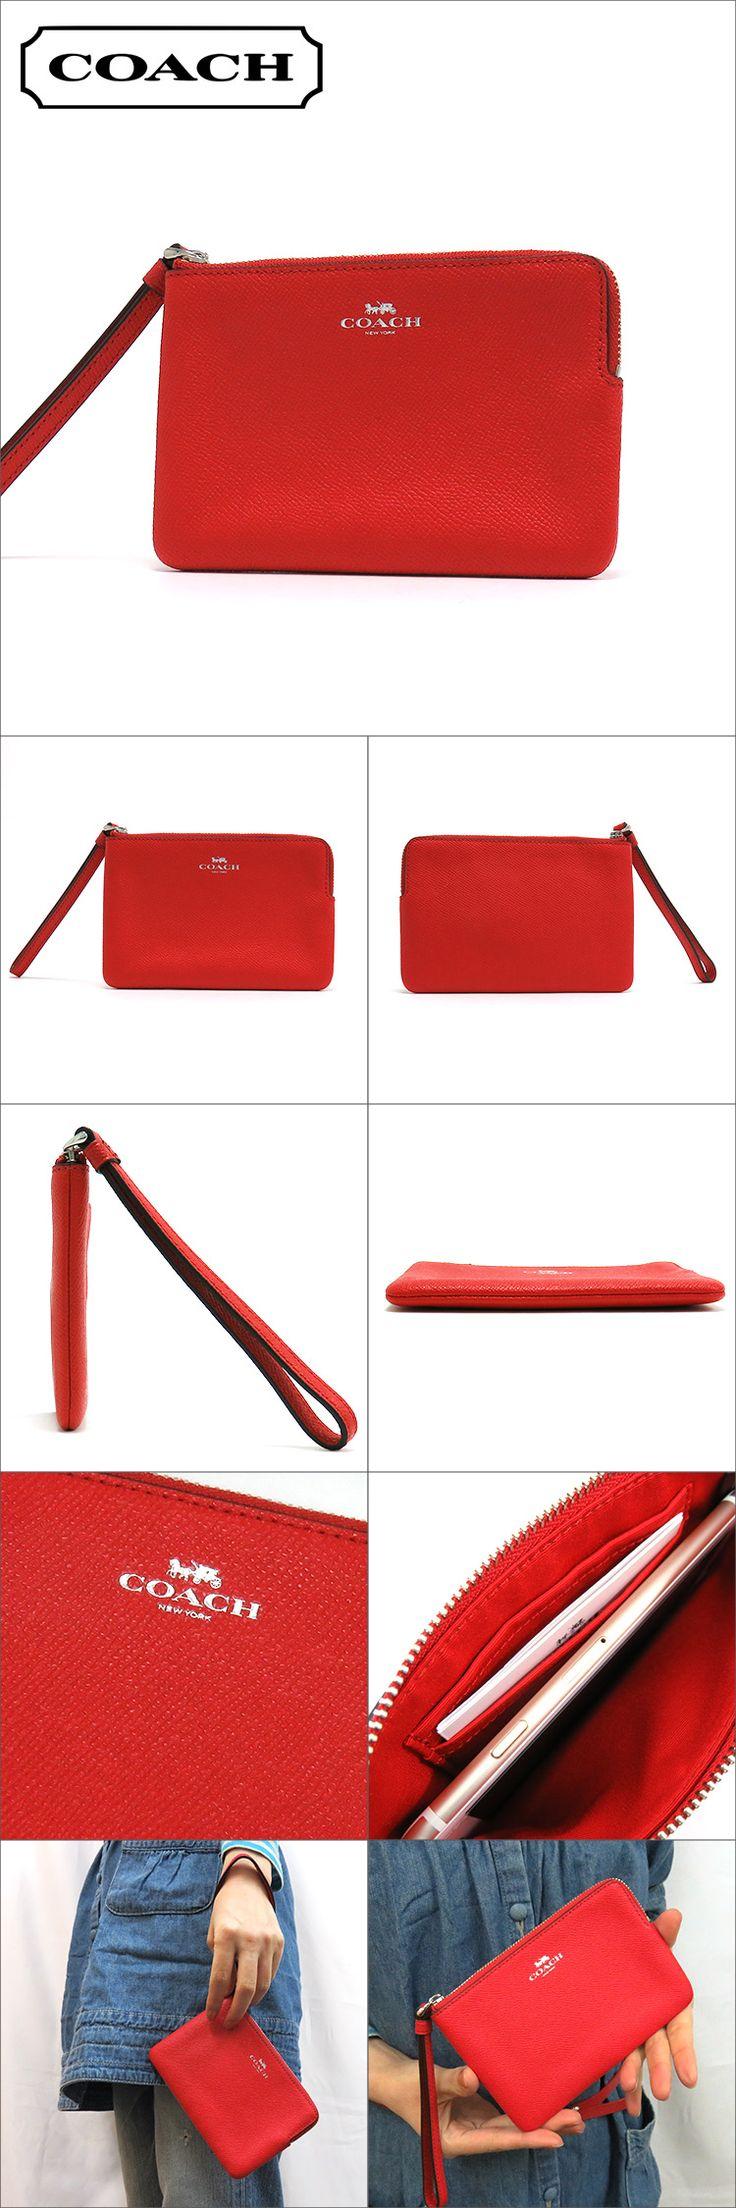 mkcollection | Rakuten Global Market: Coach porch Lady's COACH accessory blight red F58032 SVBRD